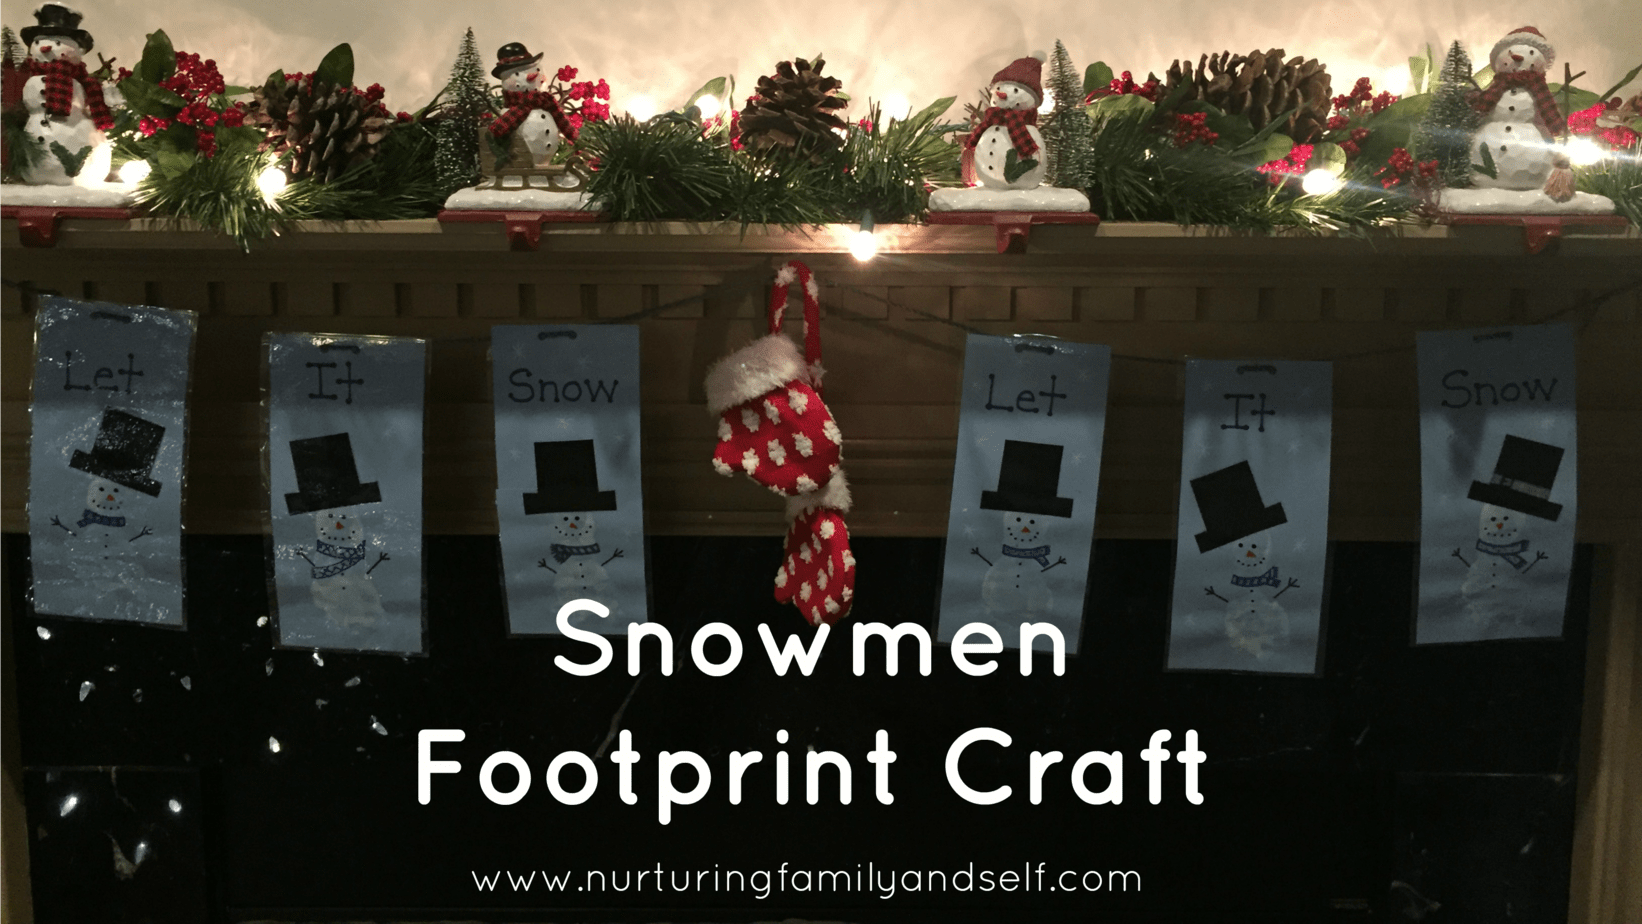 How to Make A Winter Decoration Using Footprint Snowmen